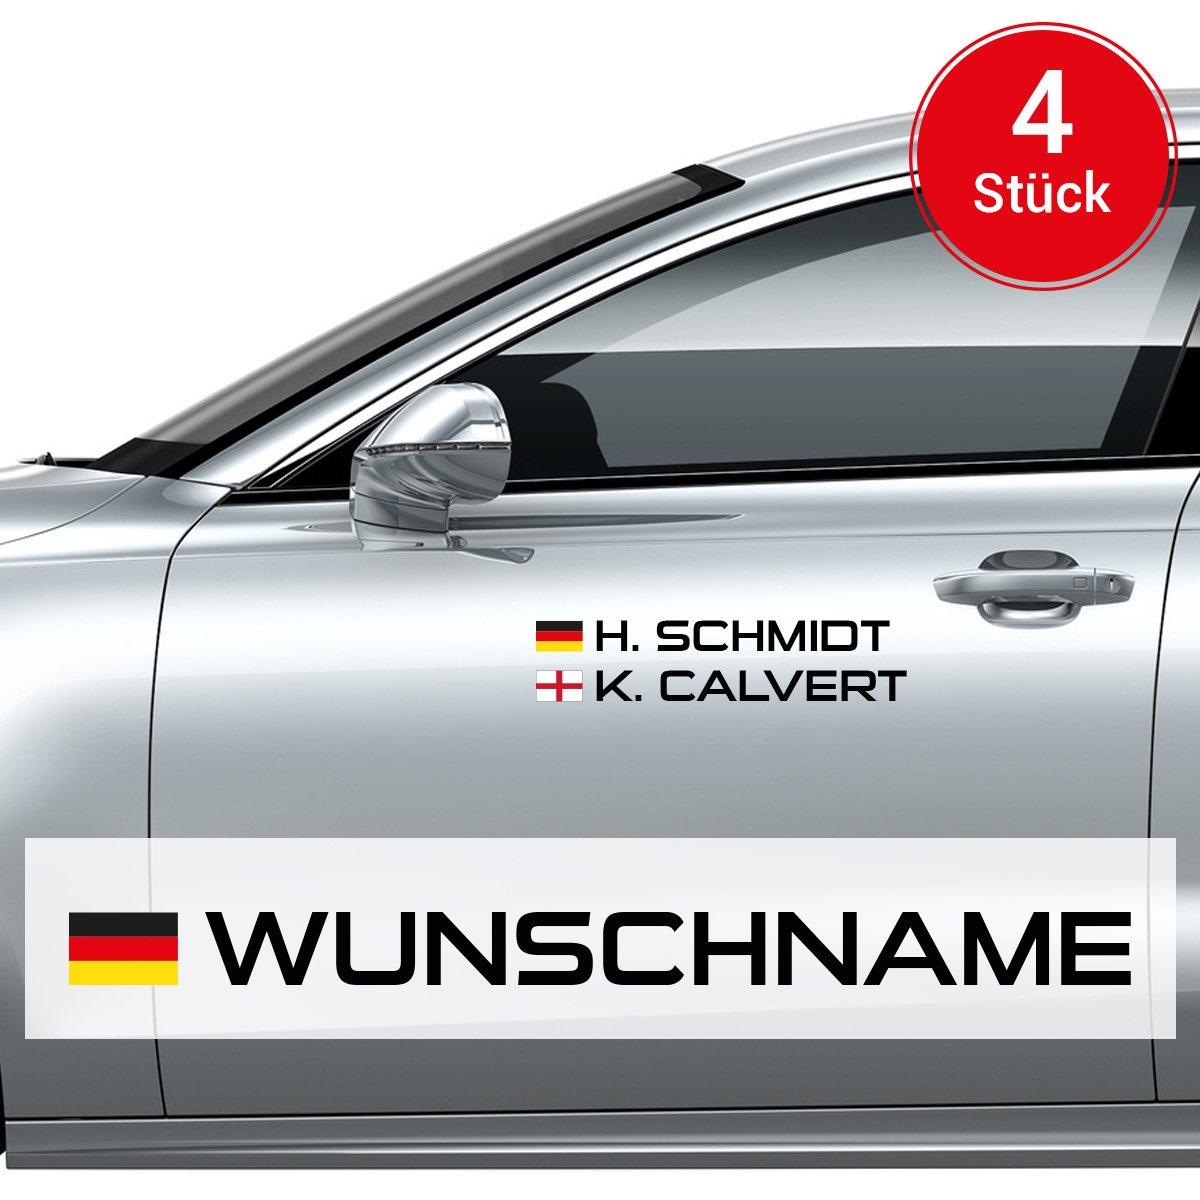 Motoking Autoaufkleber Name & Flagge - 4 Stü ck - Ihr Wunschname im Rallye-/Racing-Design - Wä hle Grö ß e & Farbe